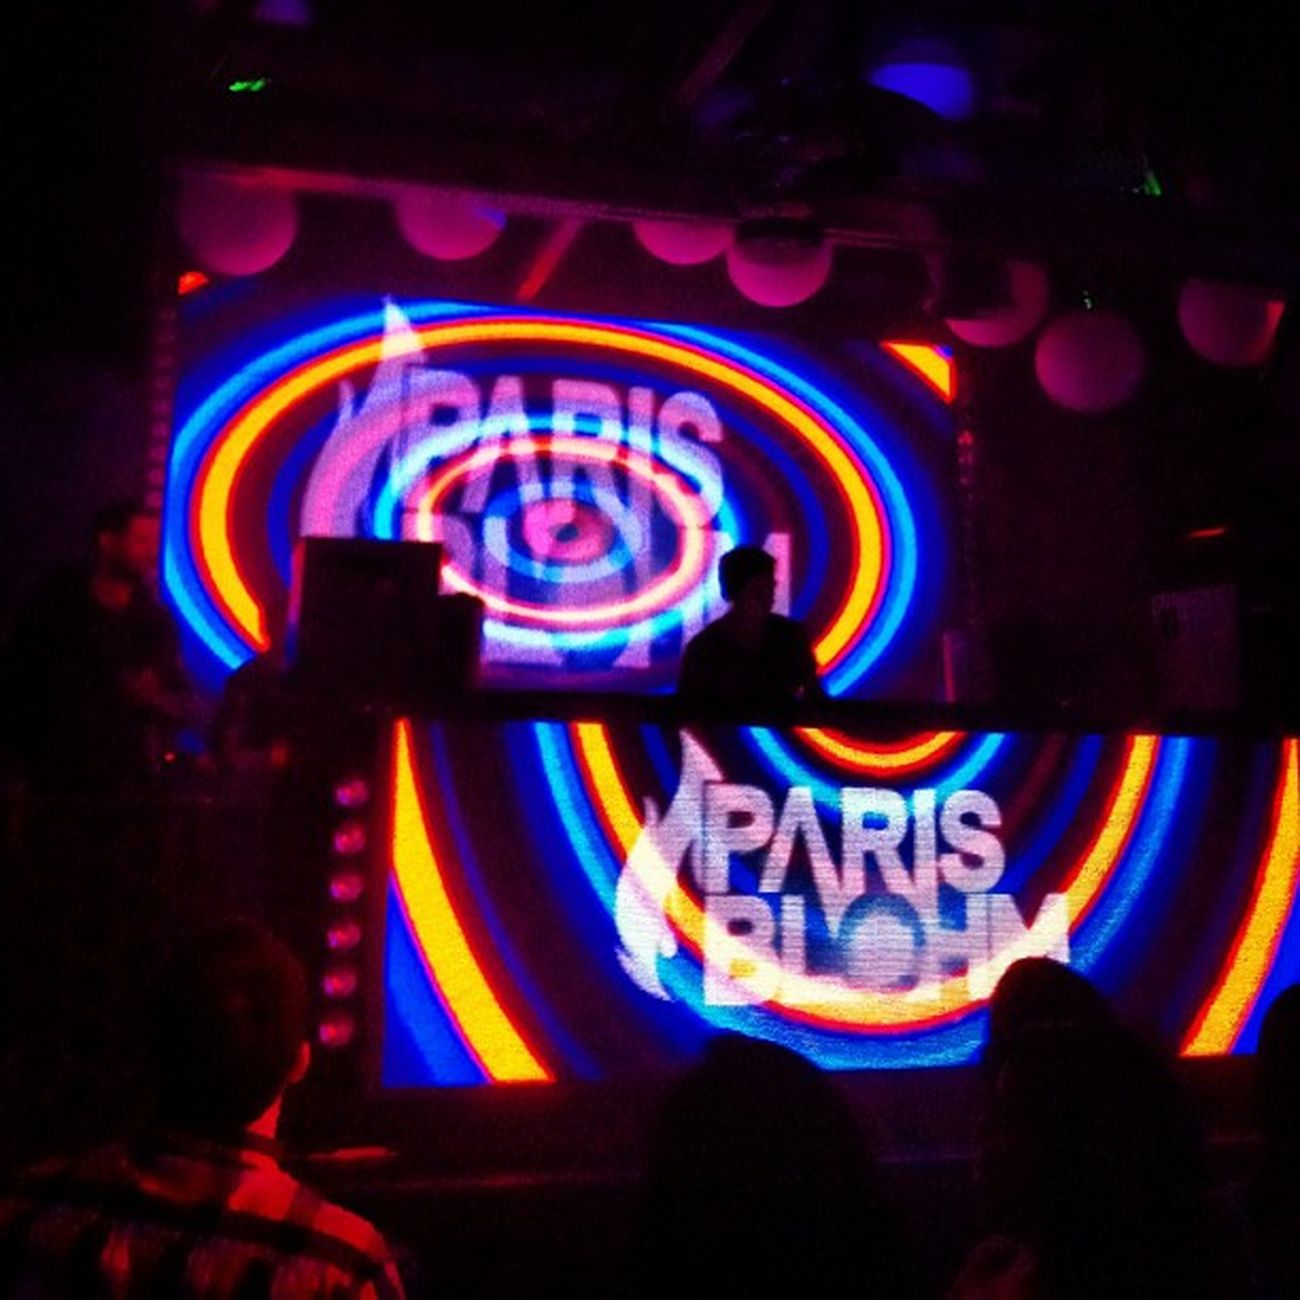 Parisblohm GTA Trap Trapsucks party edm lights trippy stoned Hollywood cali rave sick dank dope fun luresucks wamp lightshow